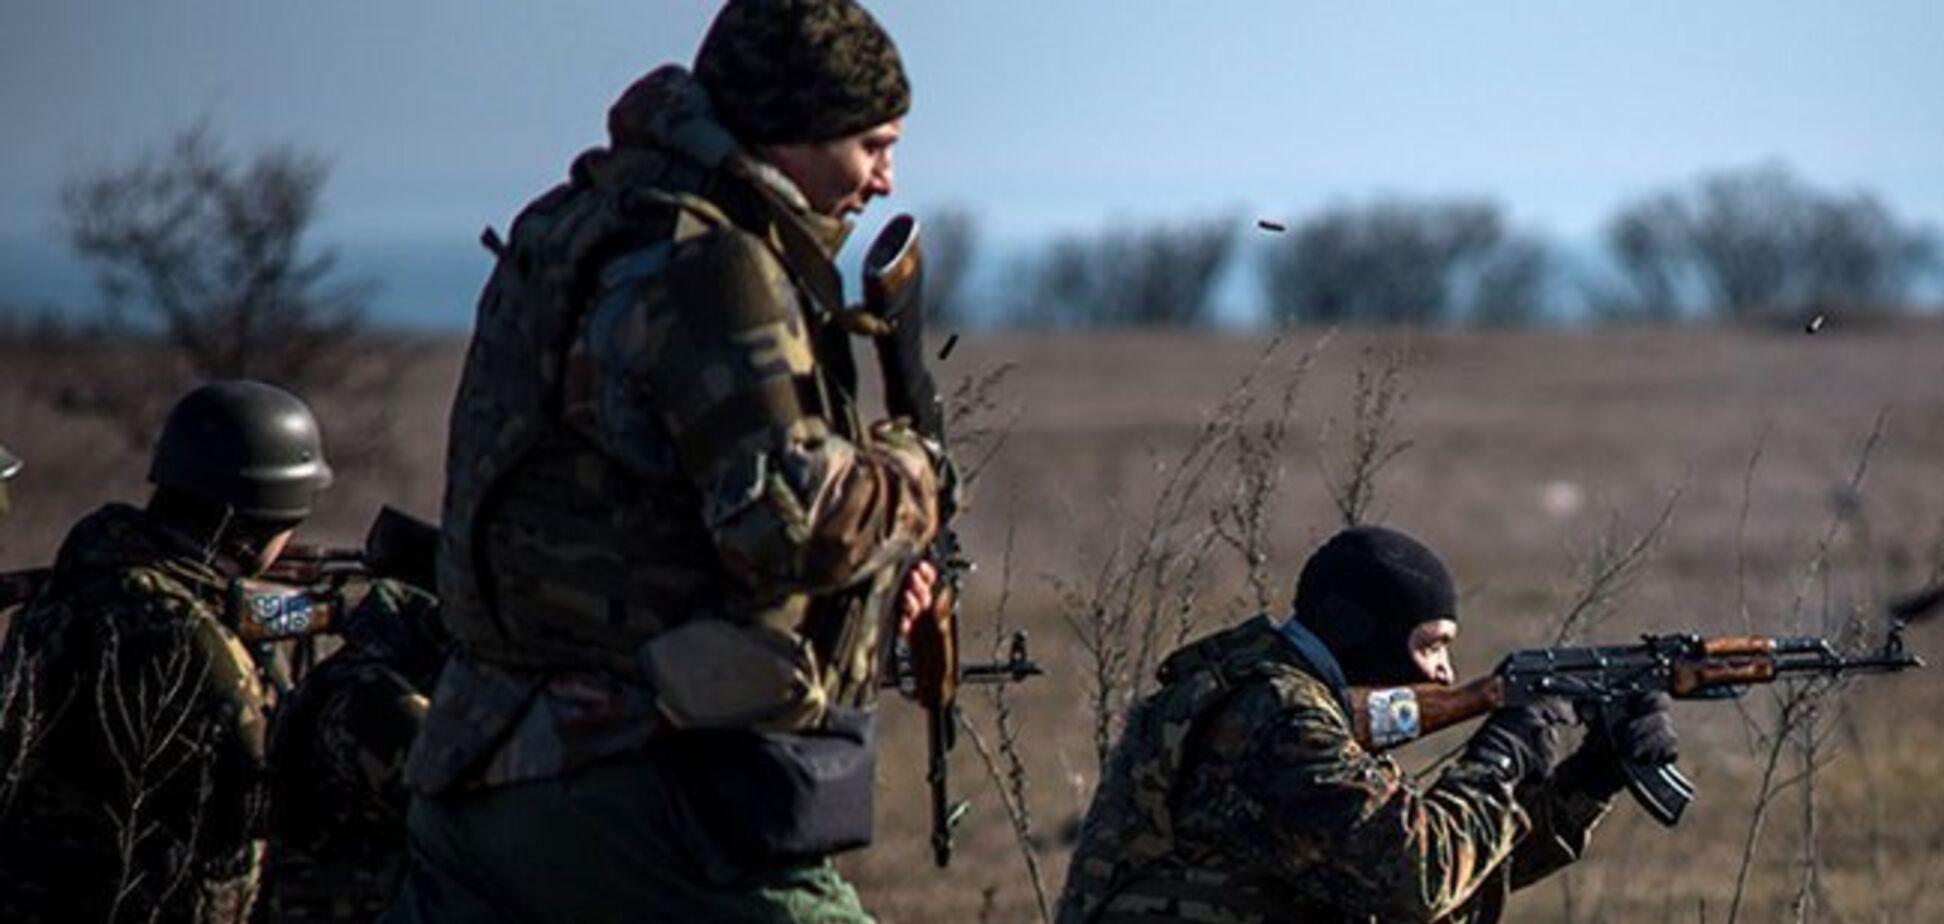 Как в 'ДНР' нагревают руки на террористах